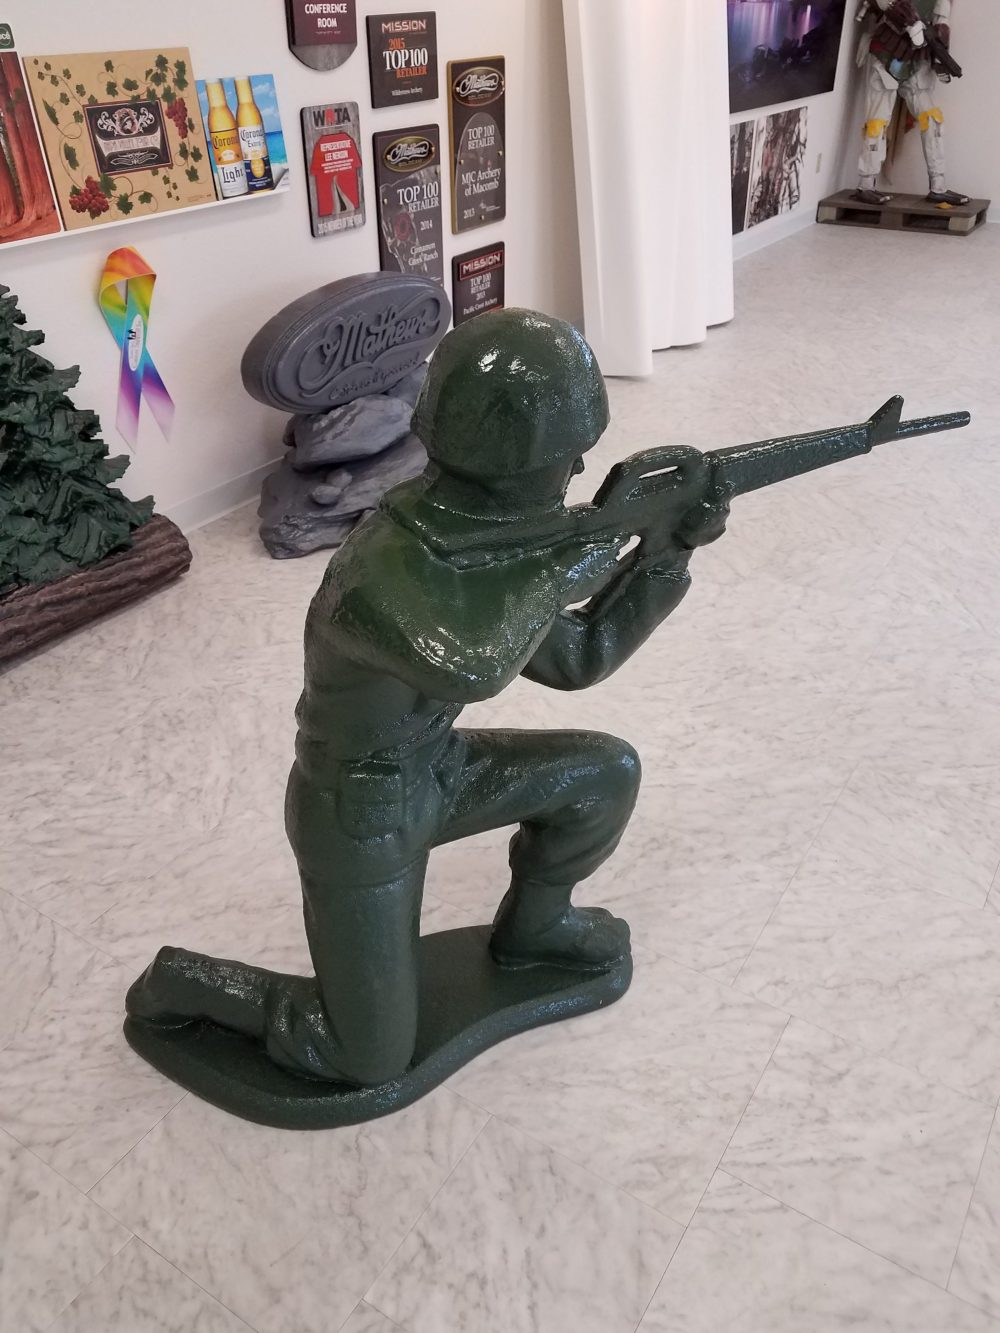 Foam Sculpting - 3' tall Green Army Man Character